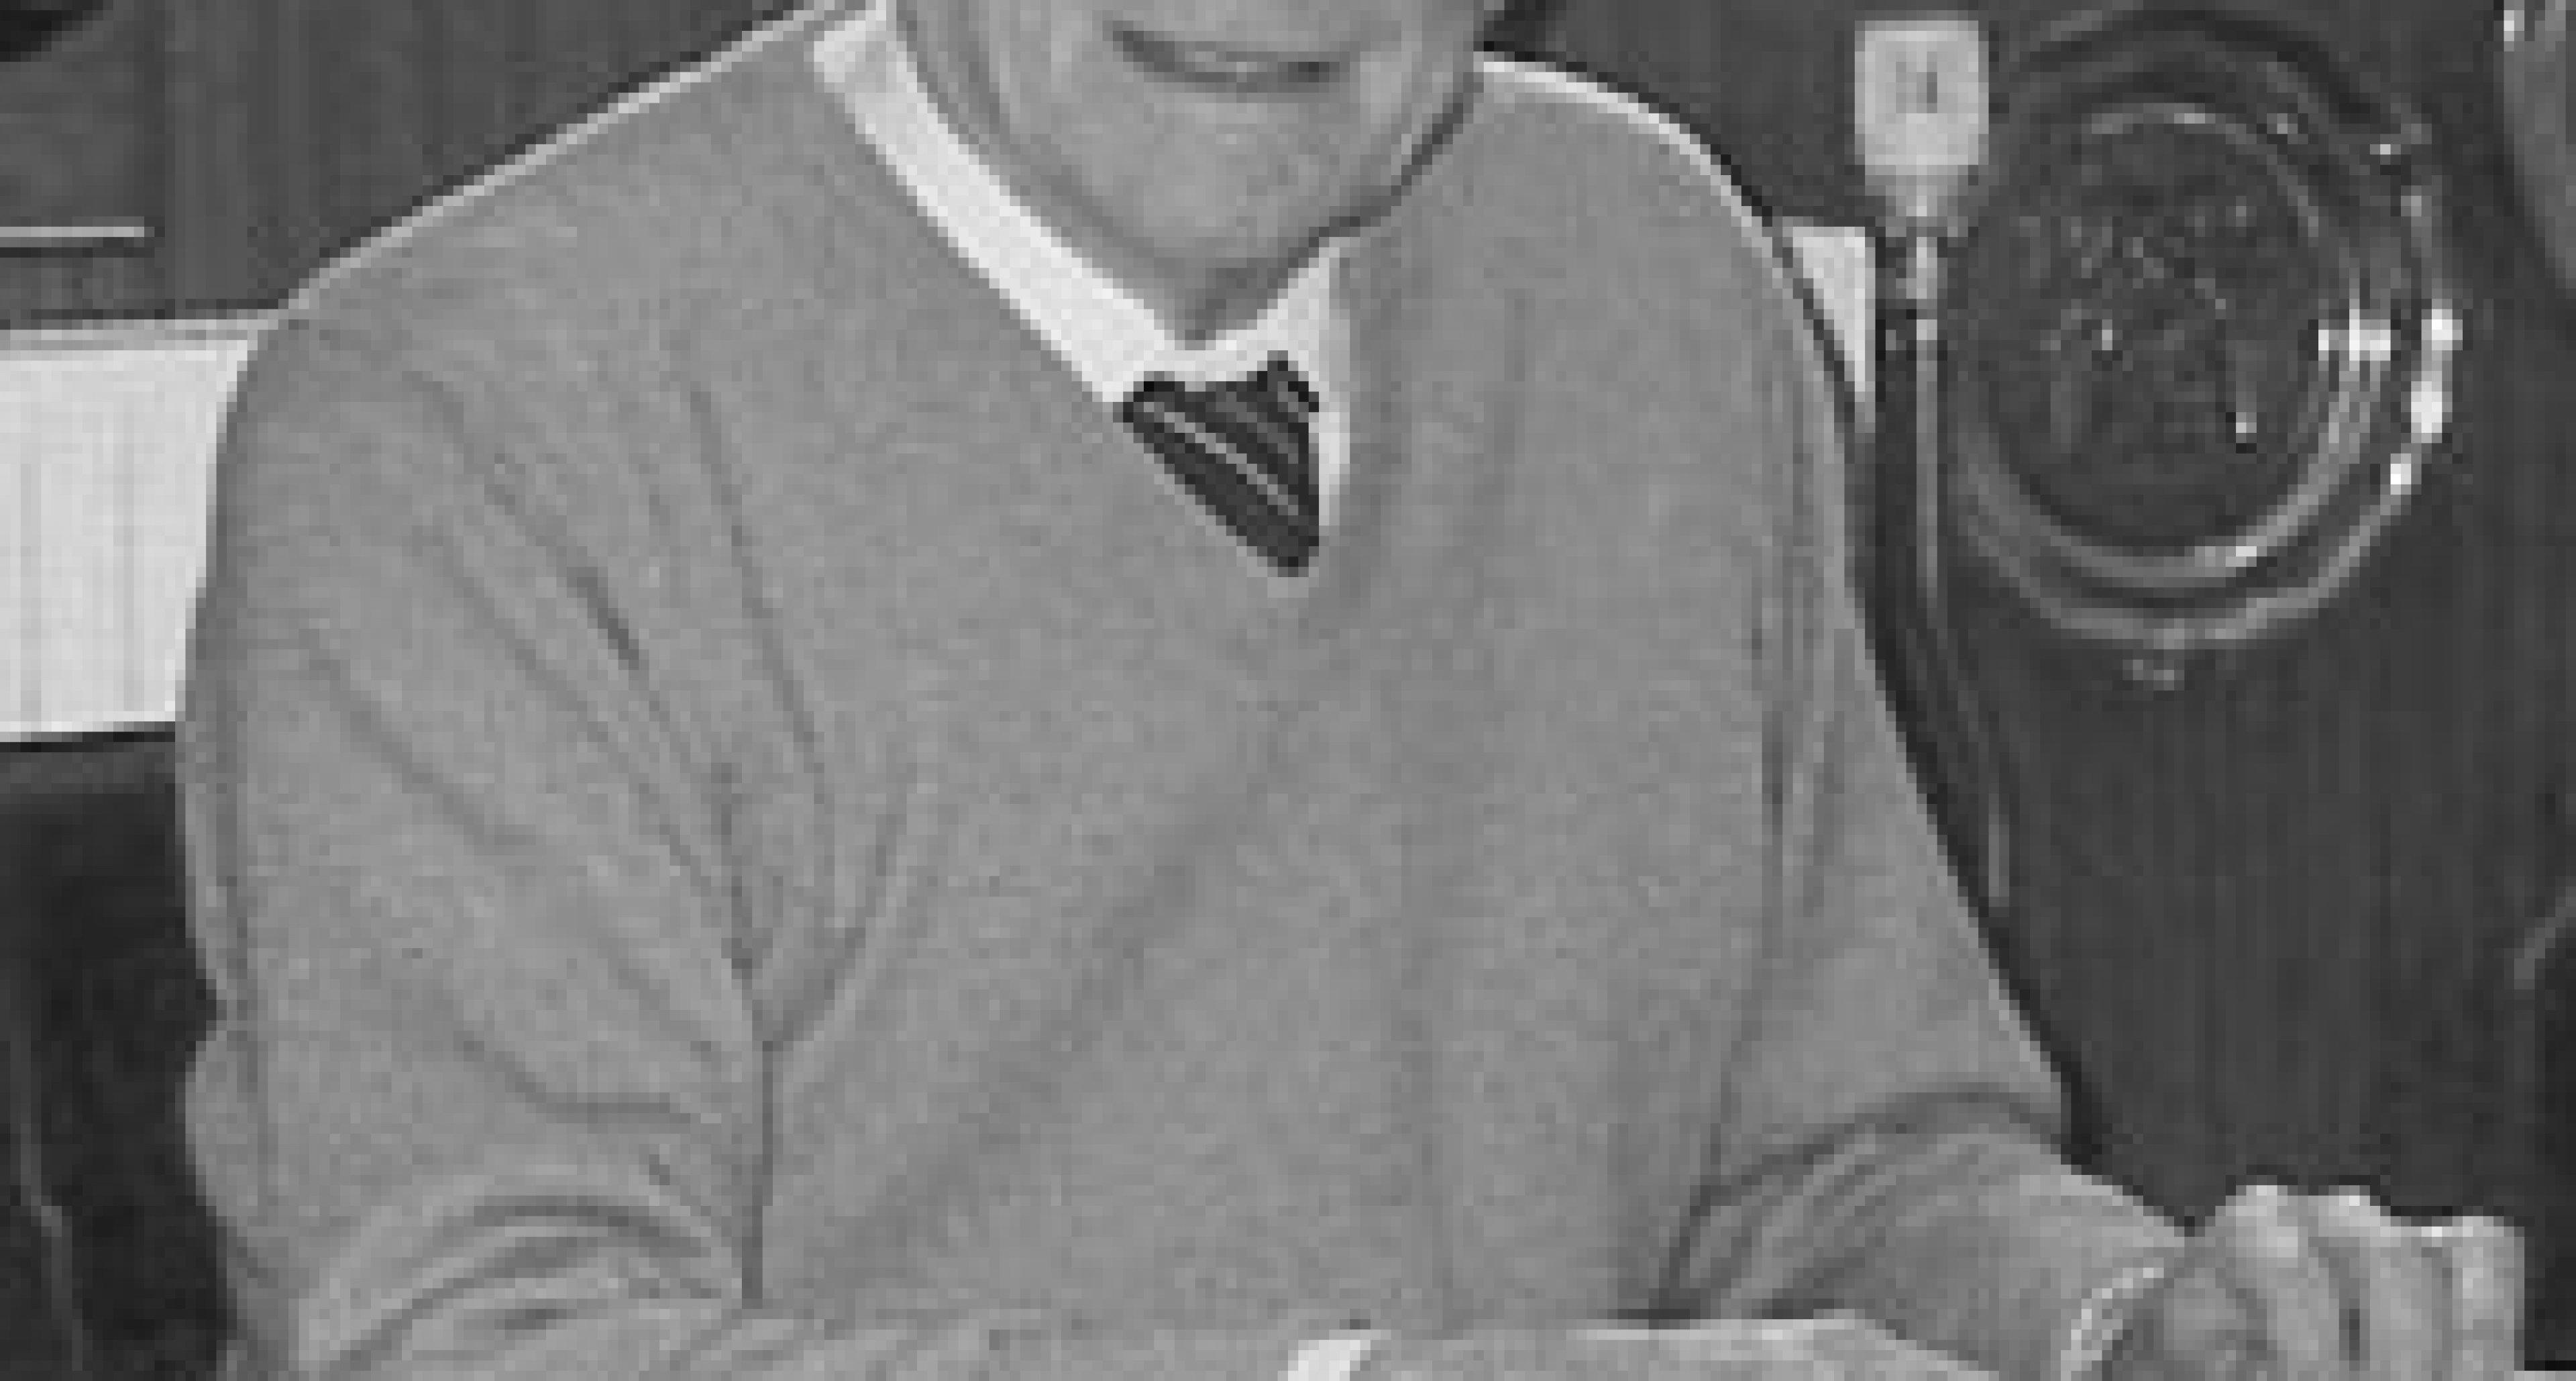 Peter H.G. Morgan gestorben